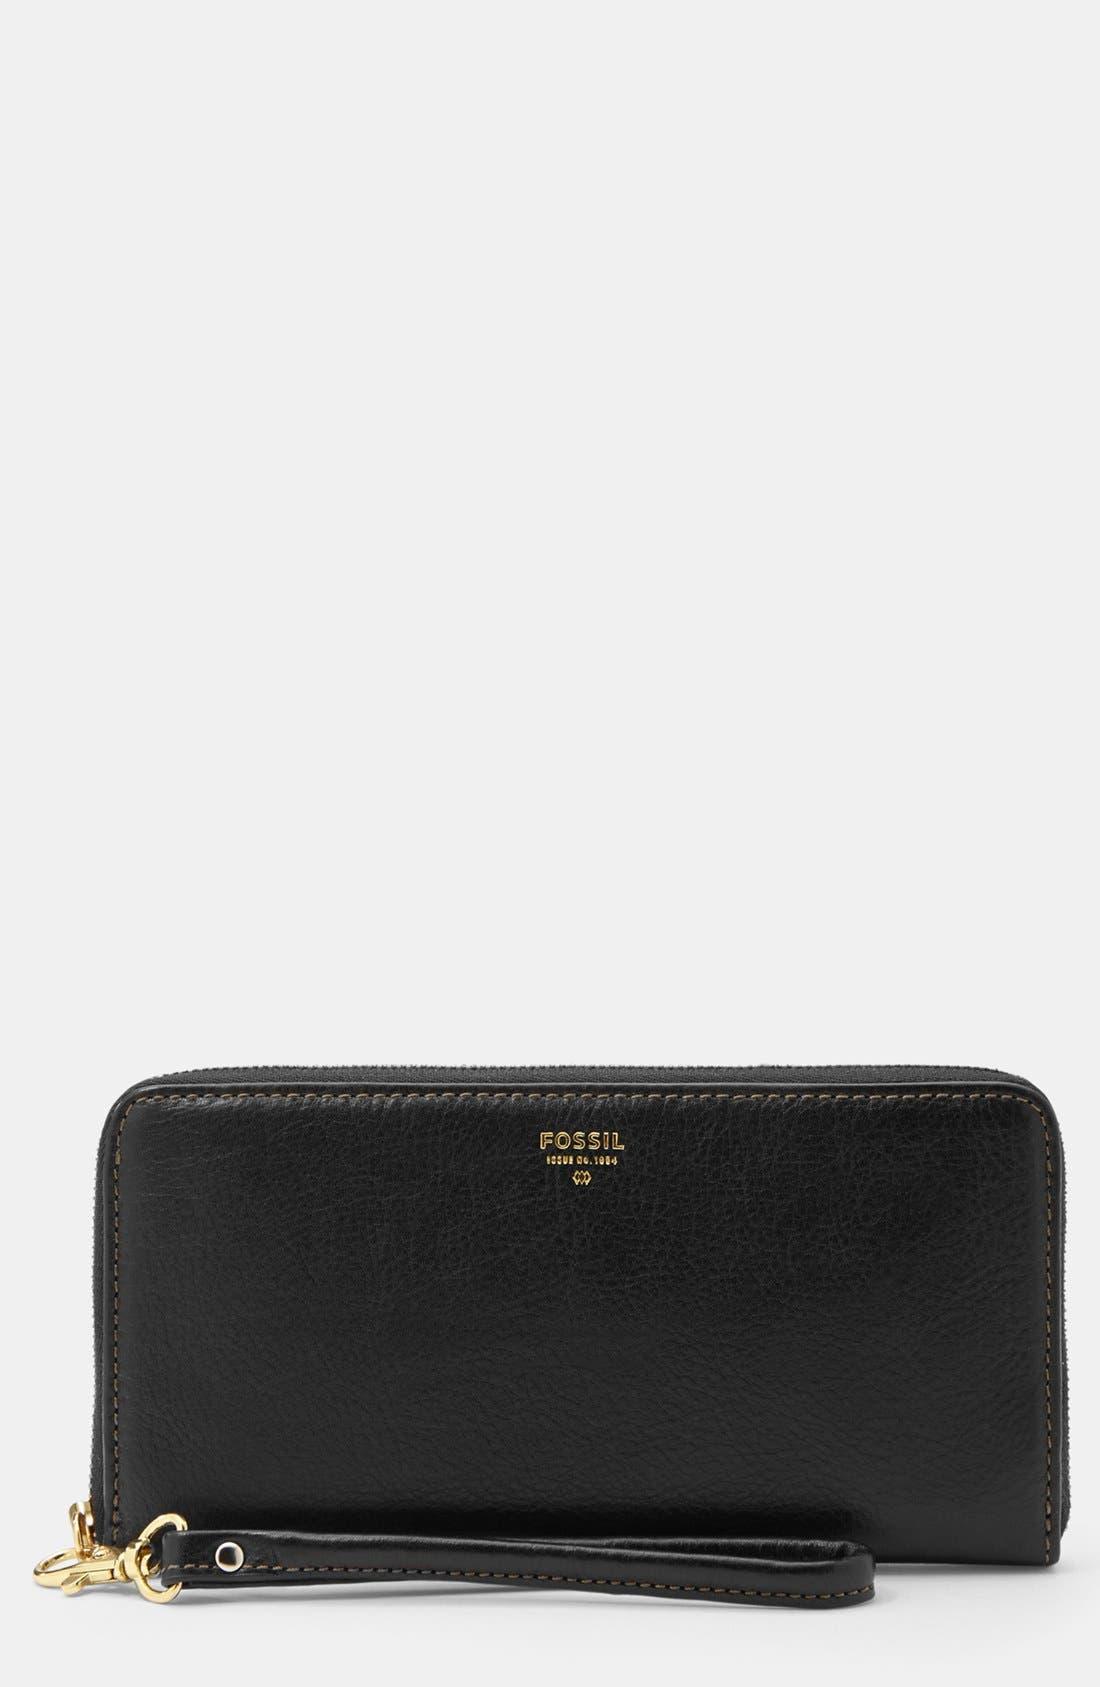 FOSSIL 'Sydney' Zip Clutch Wallet, Main, color, 001